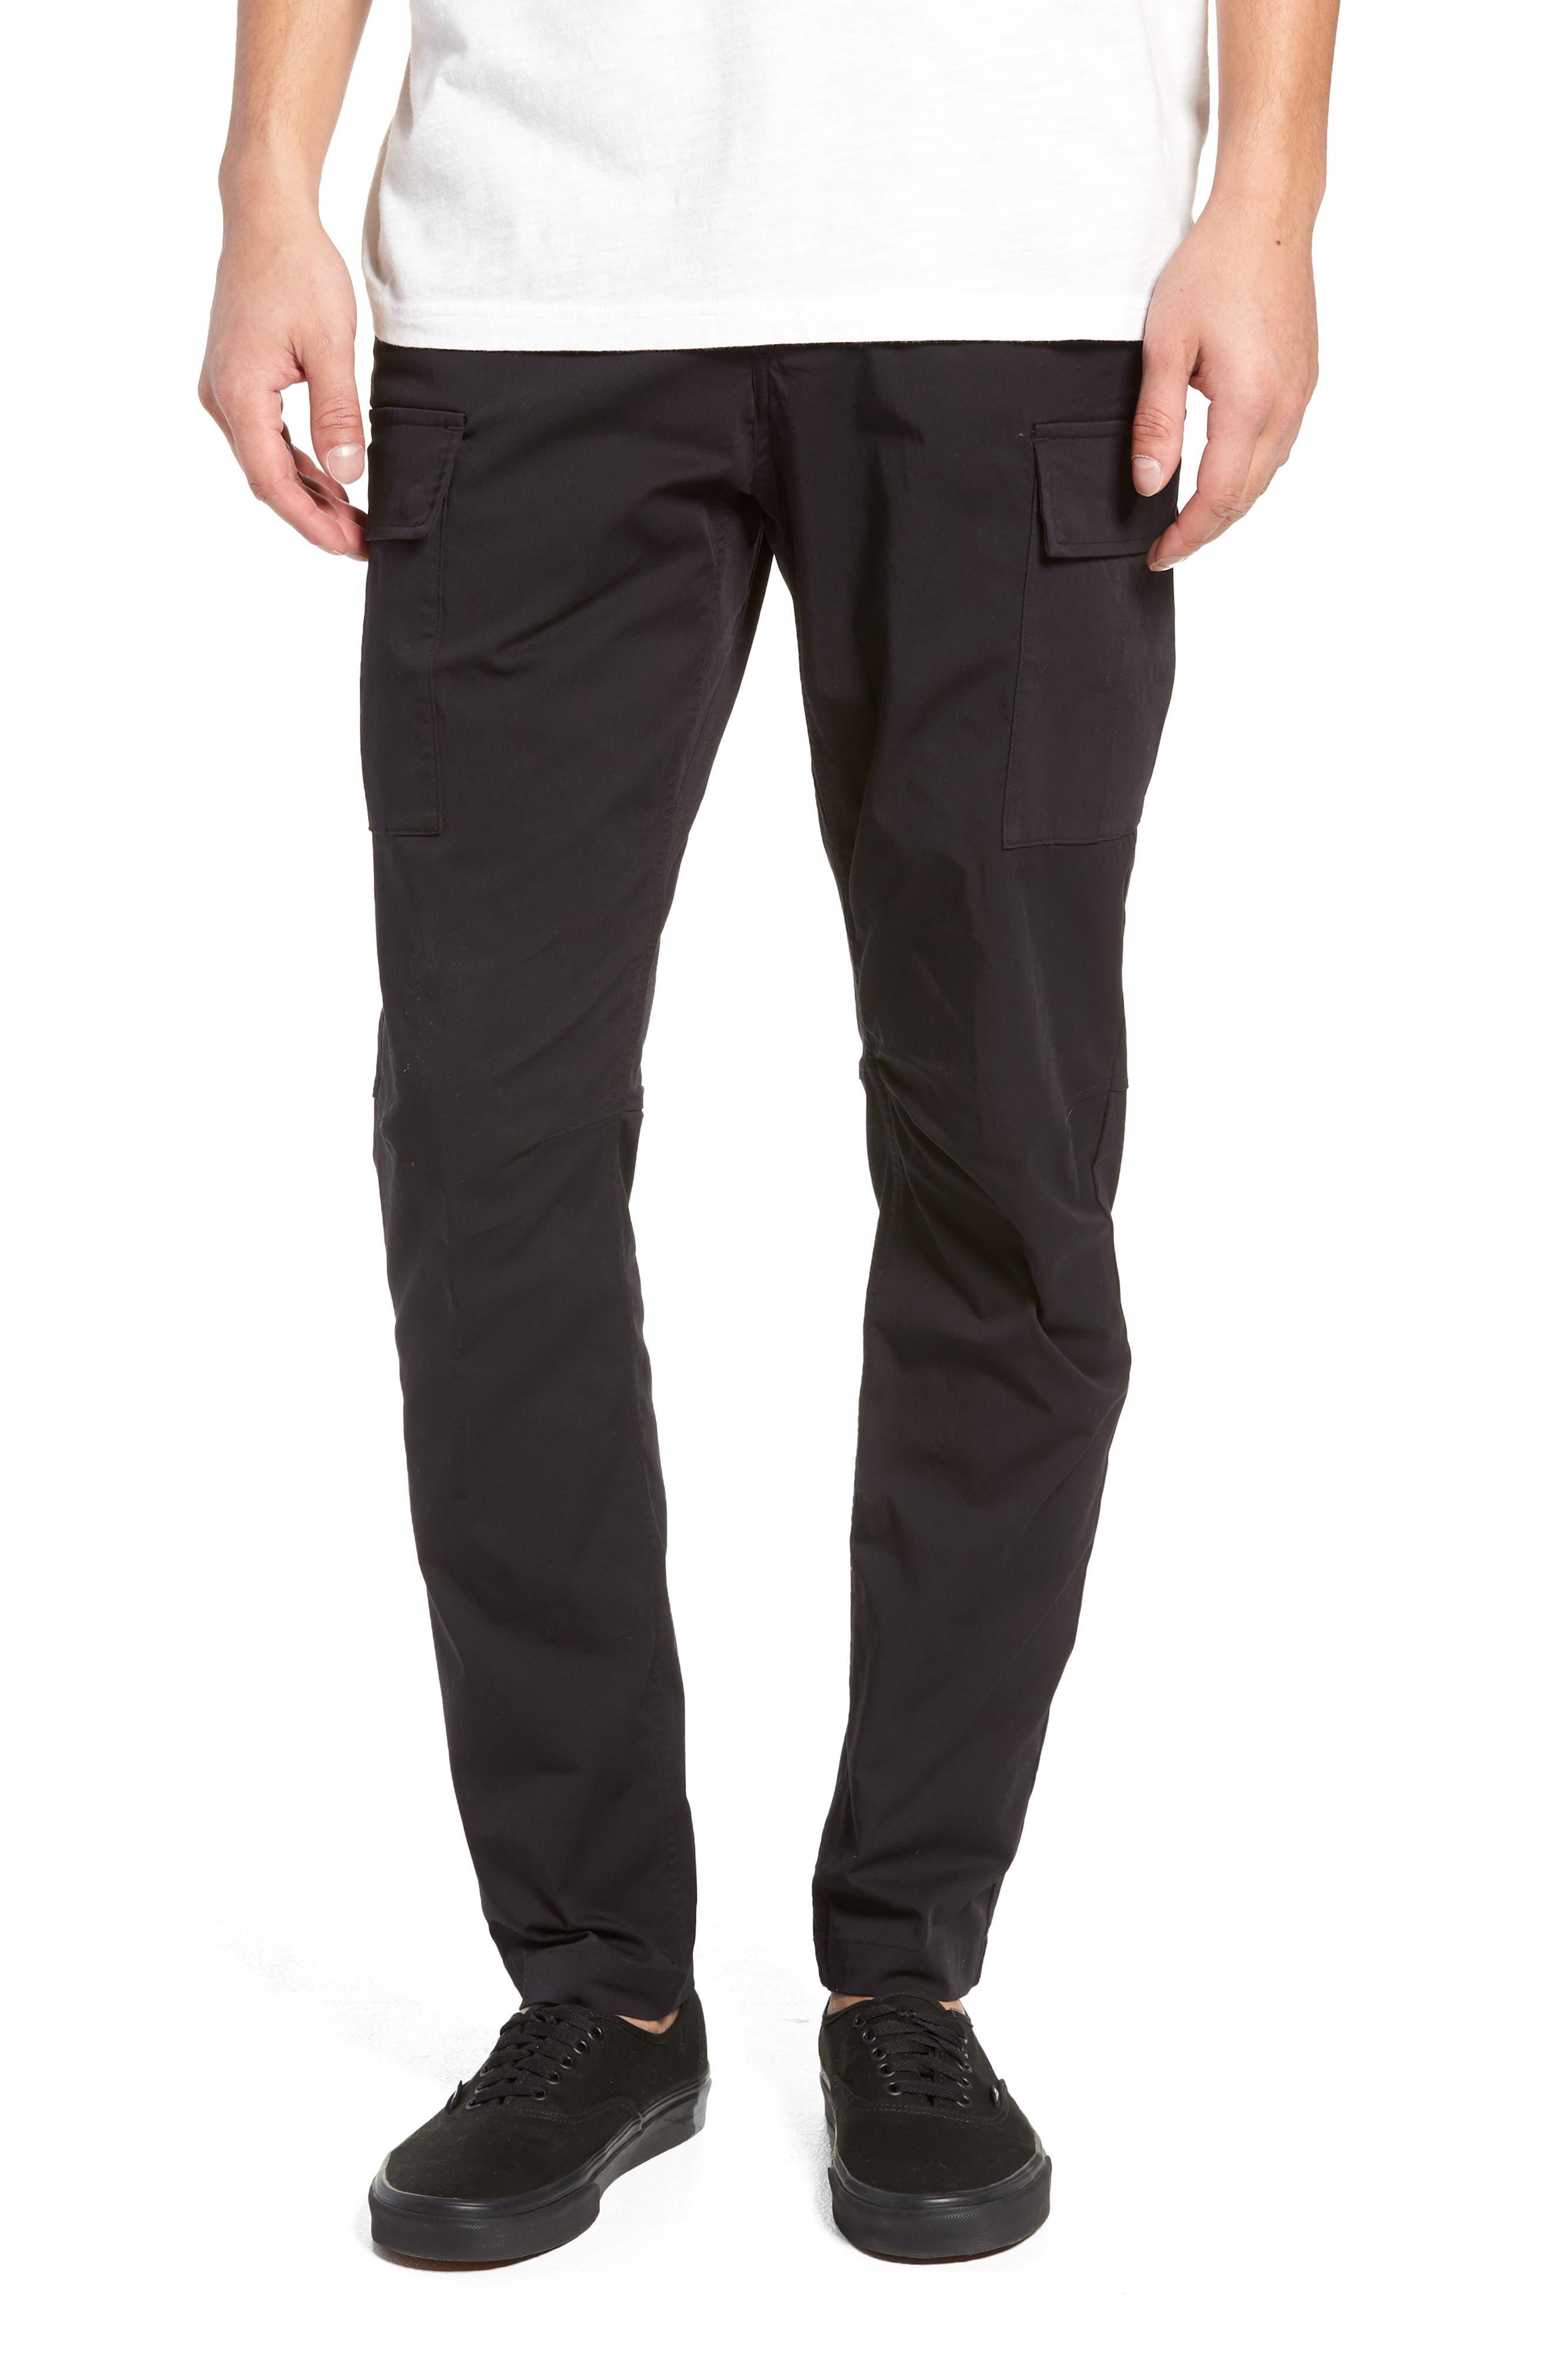 Cordura Slim Fit Cargo Pants,                         Main,                         color, BLACK